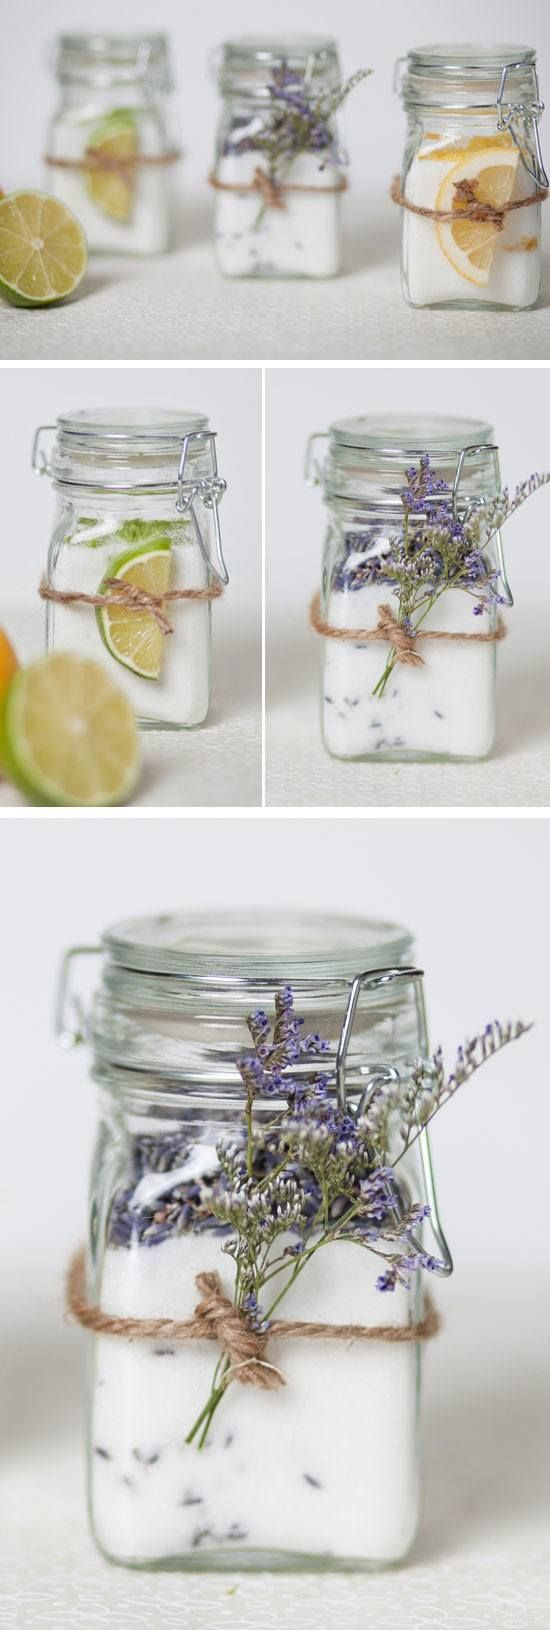 Infused Sugar Jars   DIY Bridal Shower Party Ideas on a Budget